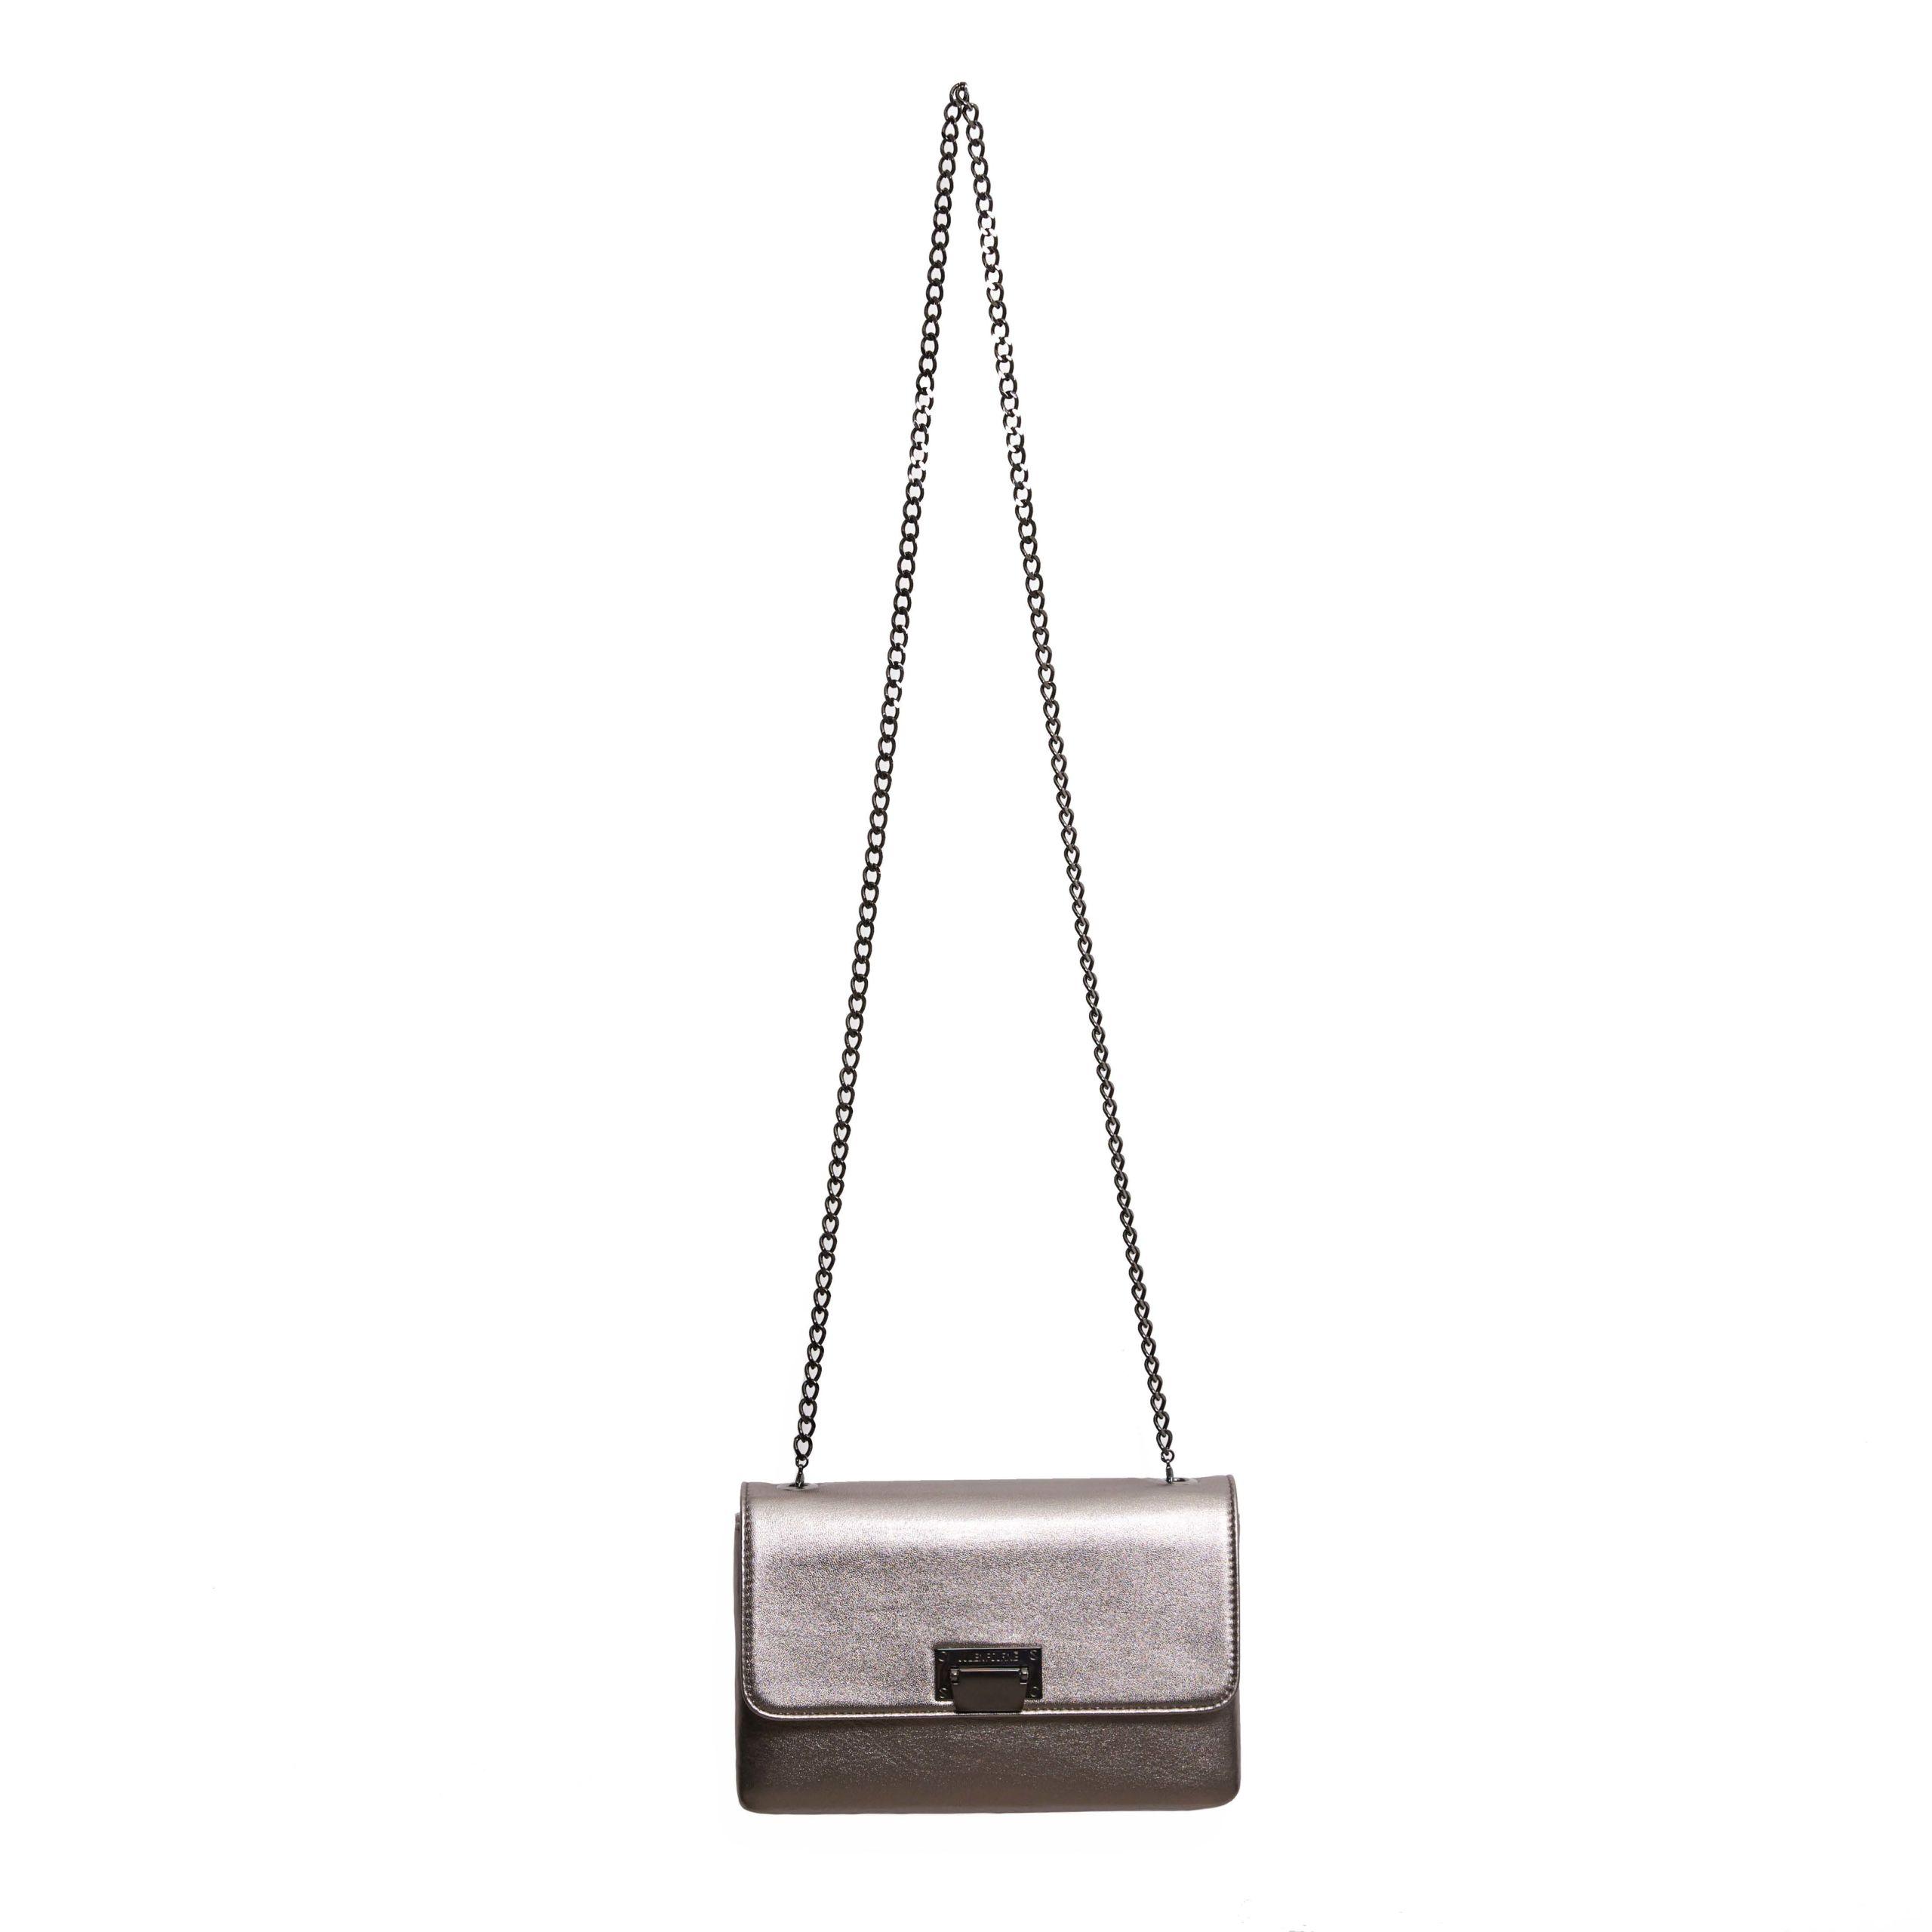 Matallic Handbag Julien Fournié Haute Couture